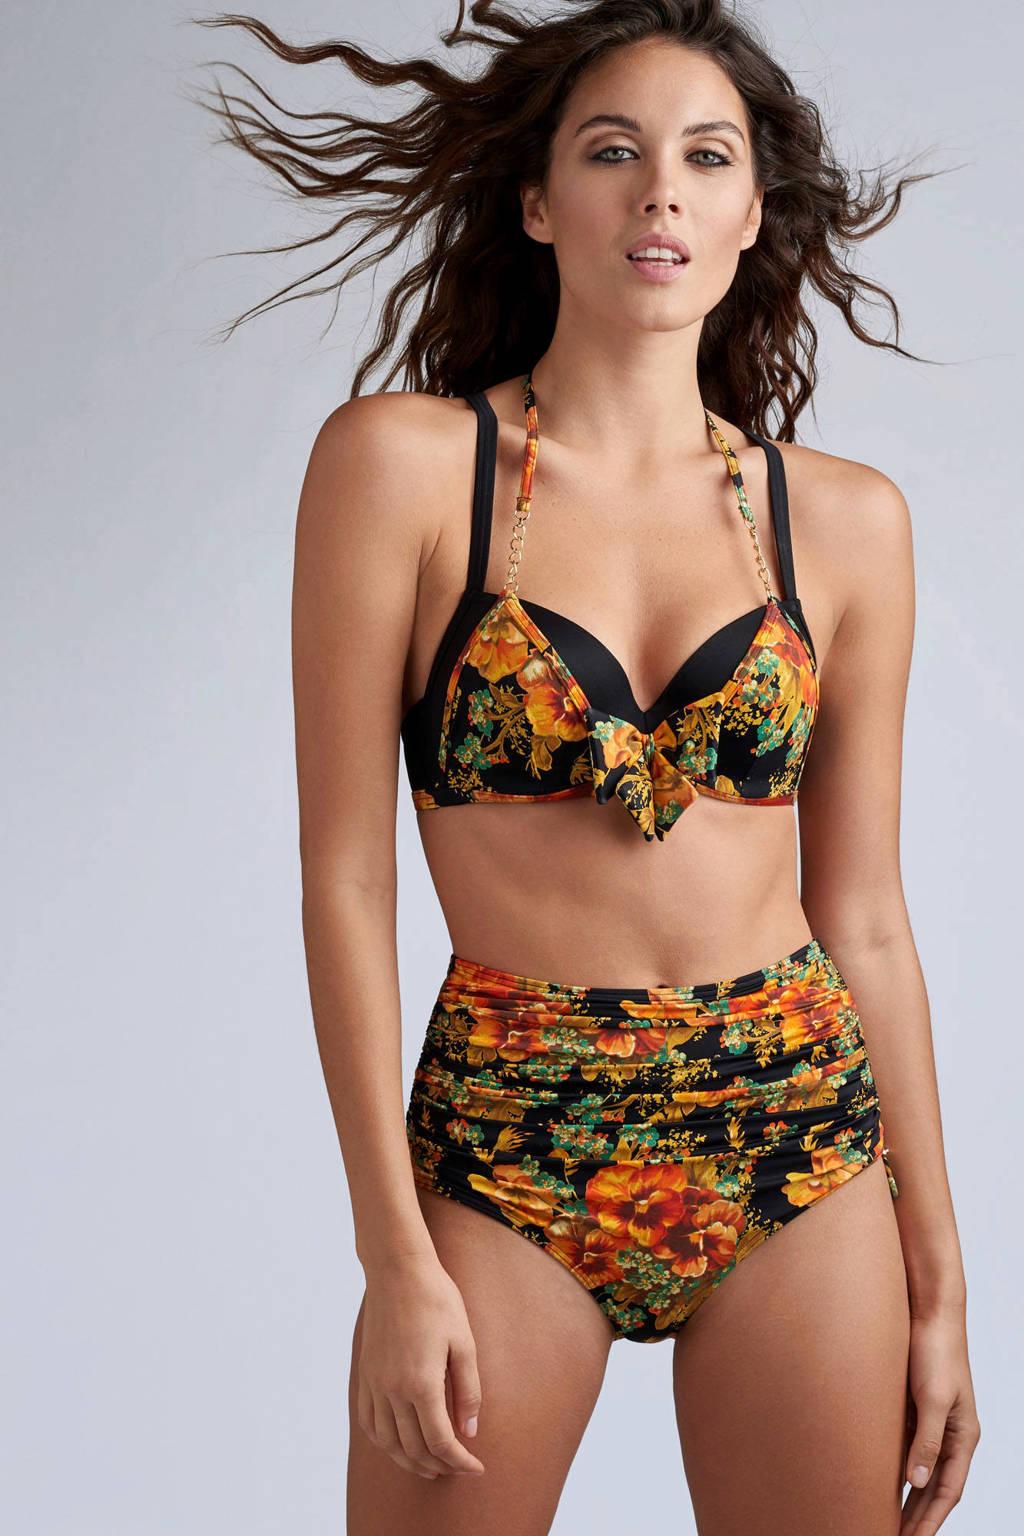 marlies dekkers Swim high waist bikinibroekje Hawaii met bloemen zwart, Oranje / zwart / groen